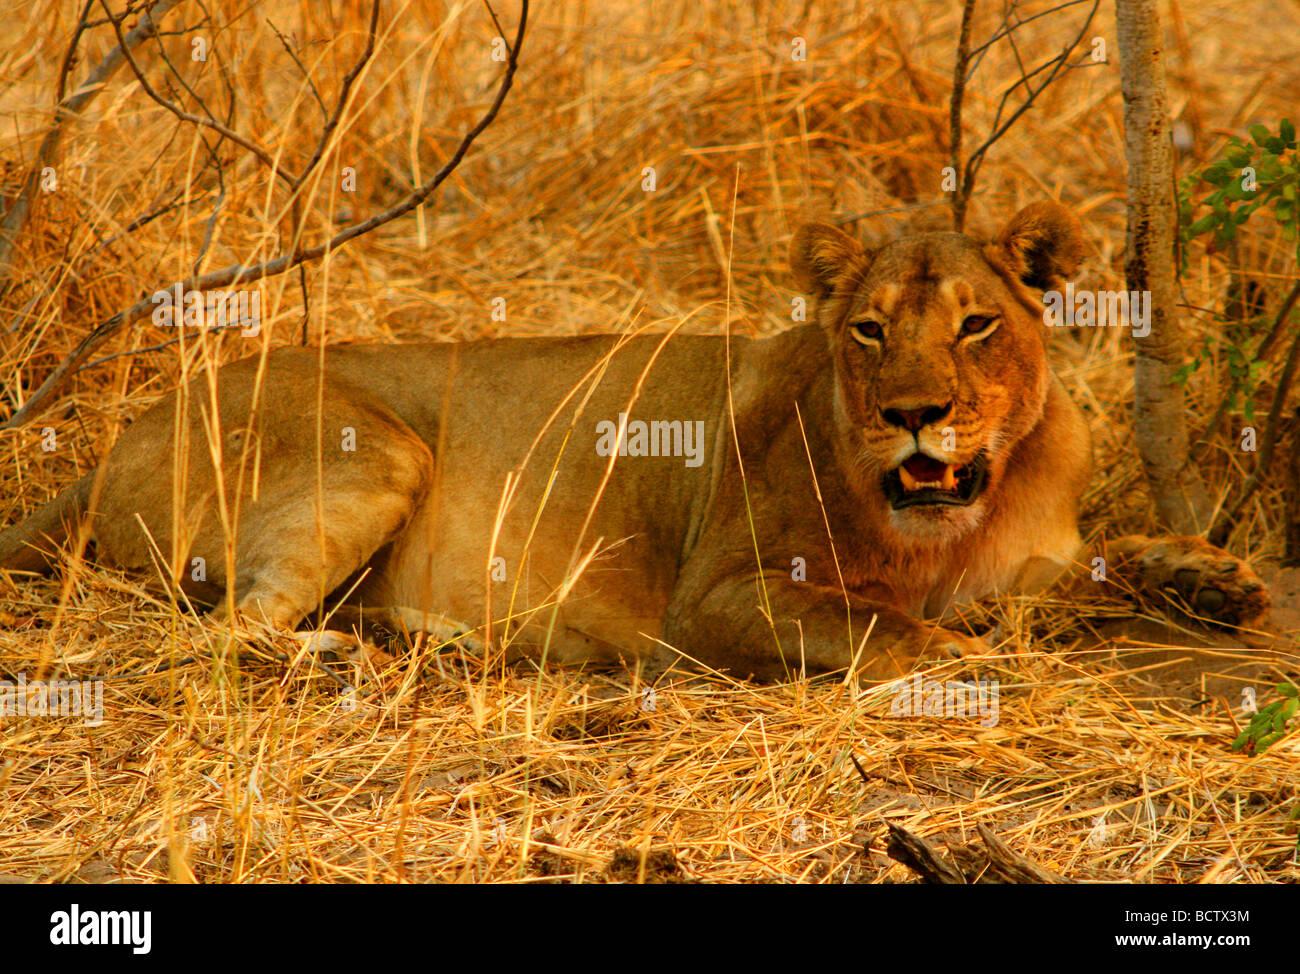 Lion (Panthera leo) sitting in a forest, Okavango Delta, Botswana - Stock Image